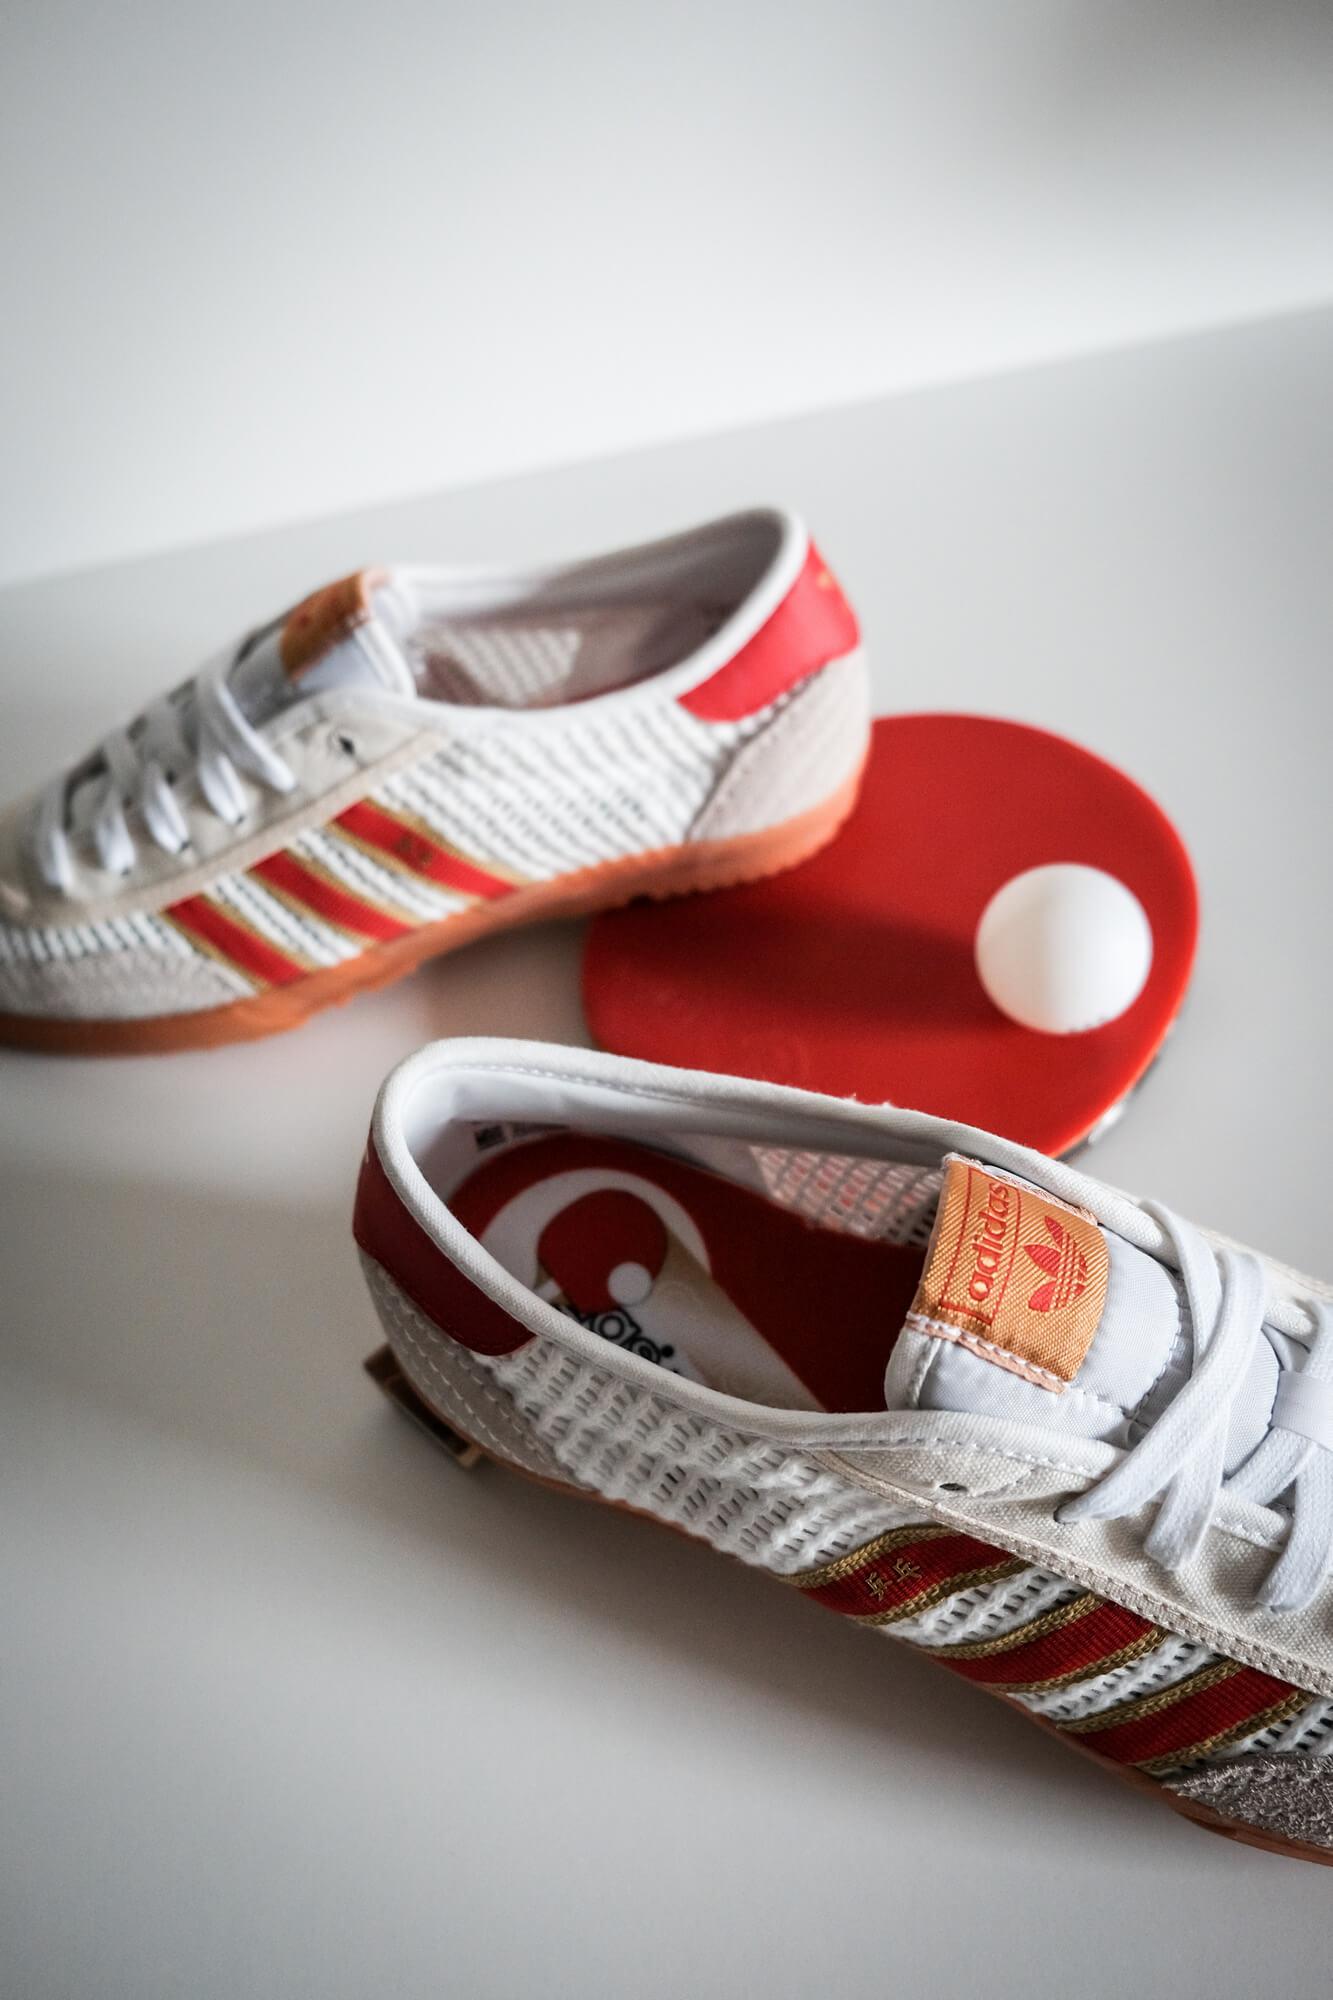 table tennis nostalgia with the adidas adidas - Tischtennis - footwear white/team college red/core white - H01796